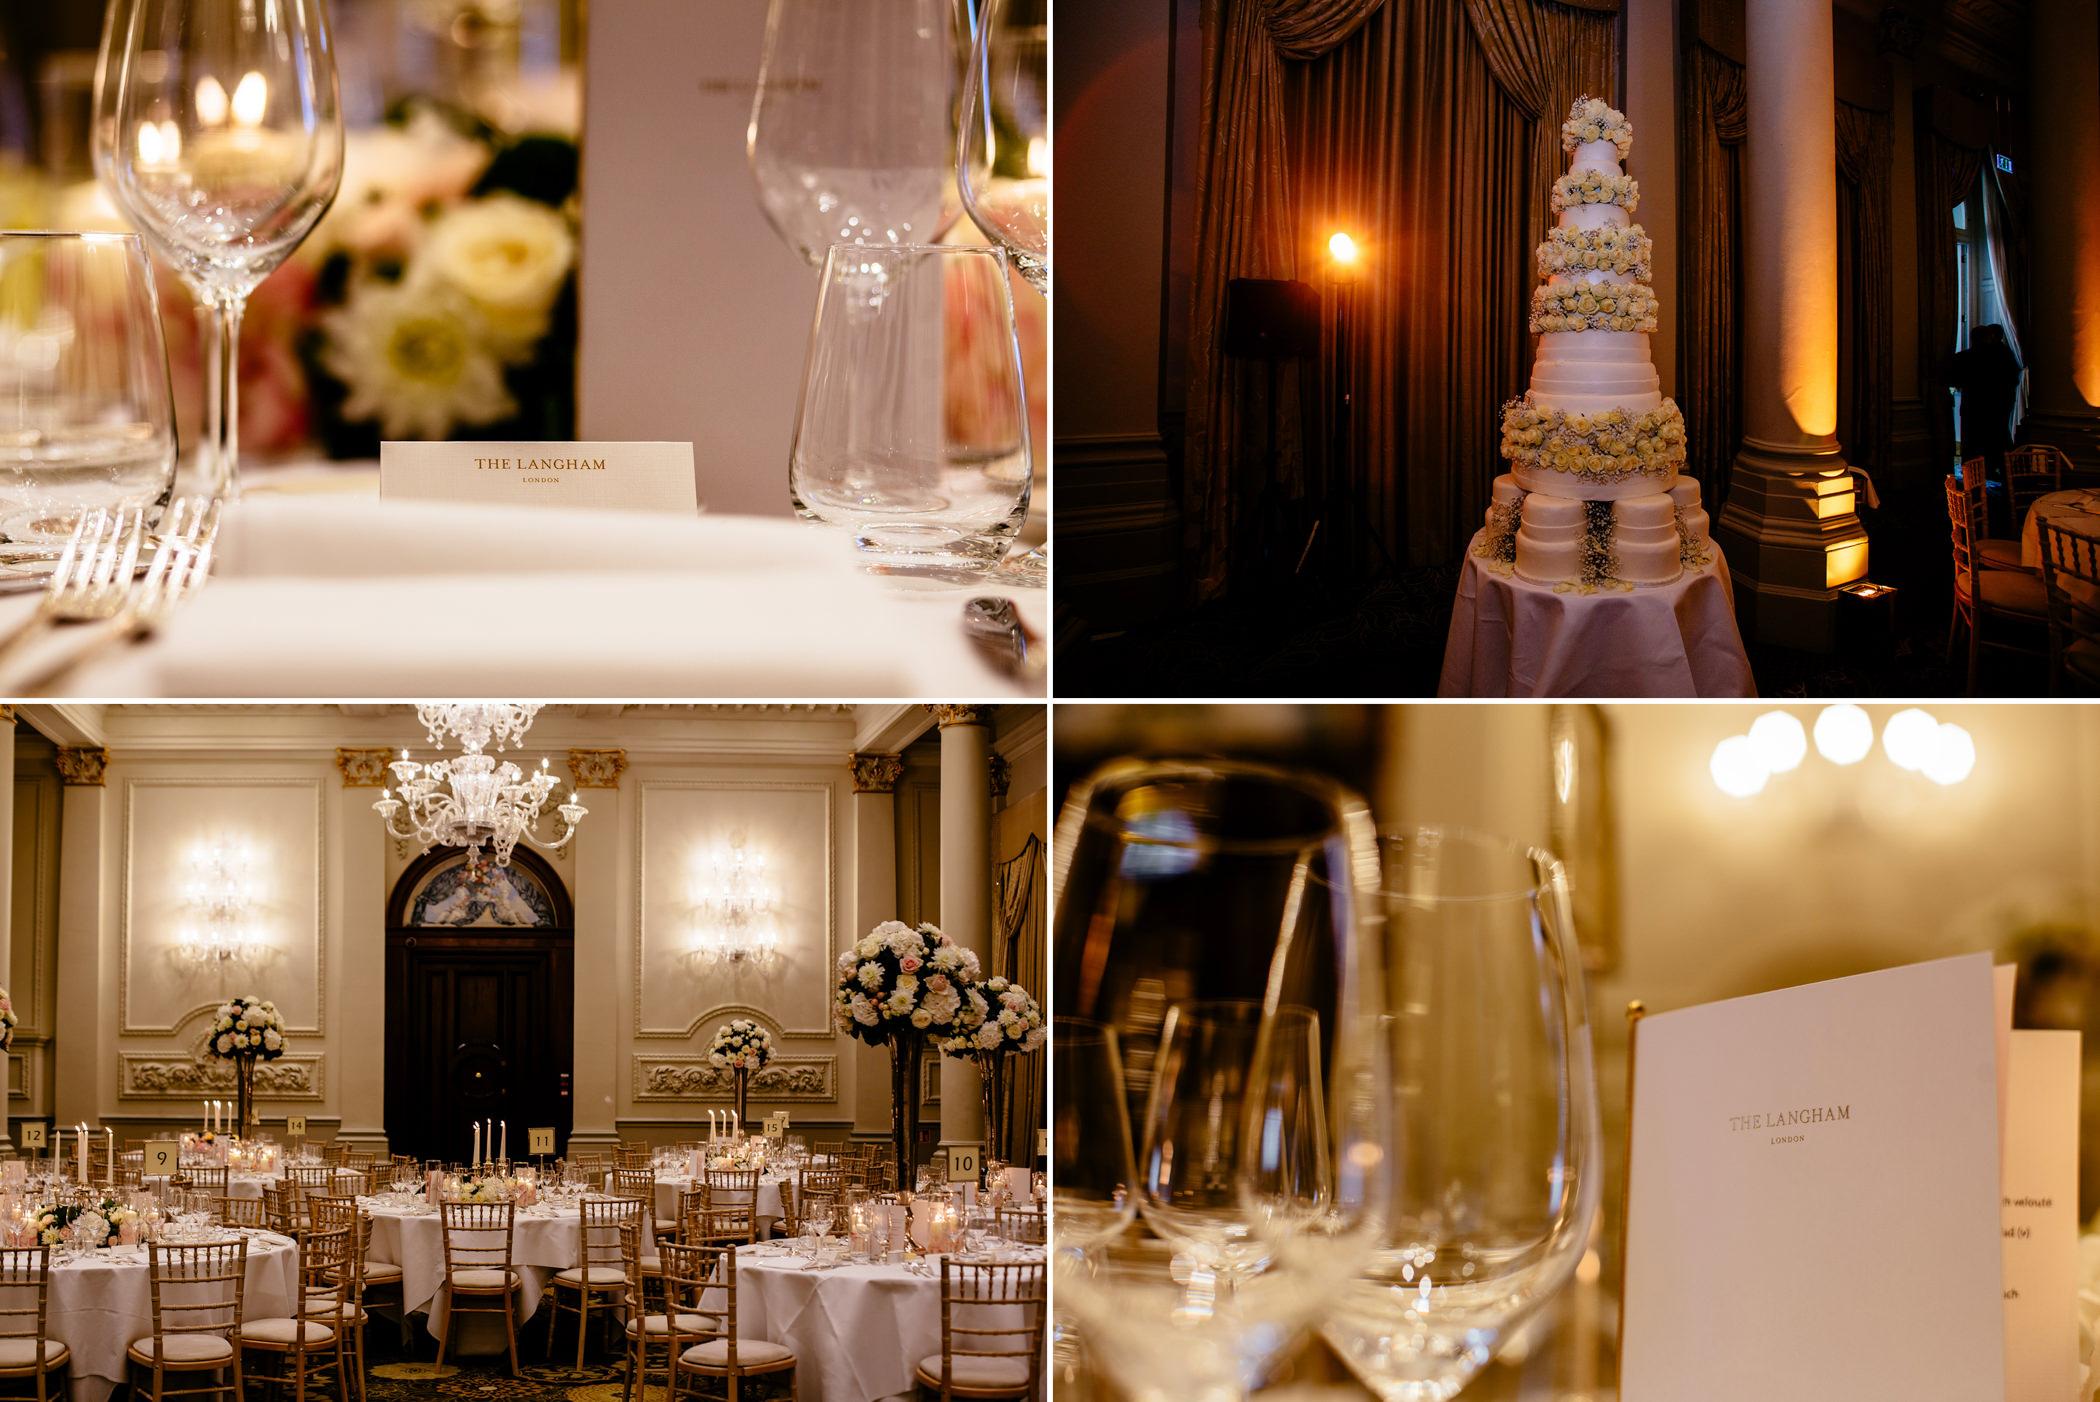 the-langham-hotel-wedding-photography-sansom-photography-naomi-mark-52